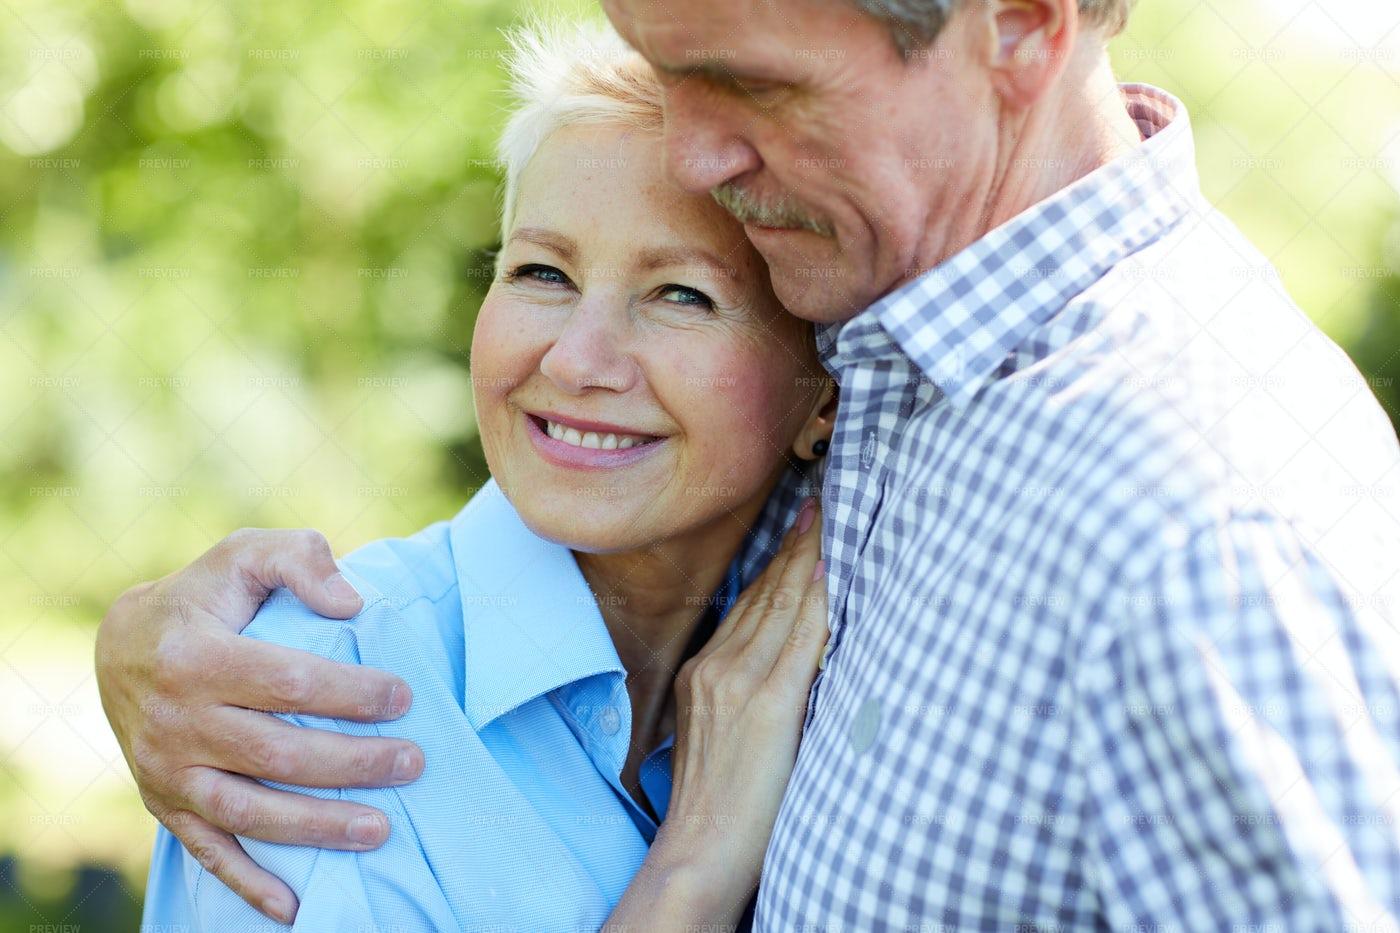 Caring Senior Couple Embracing In...: Stock Photos